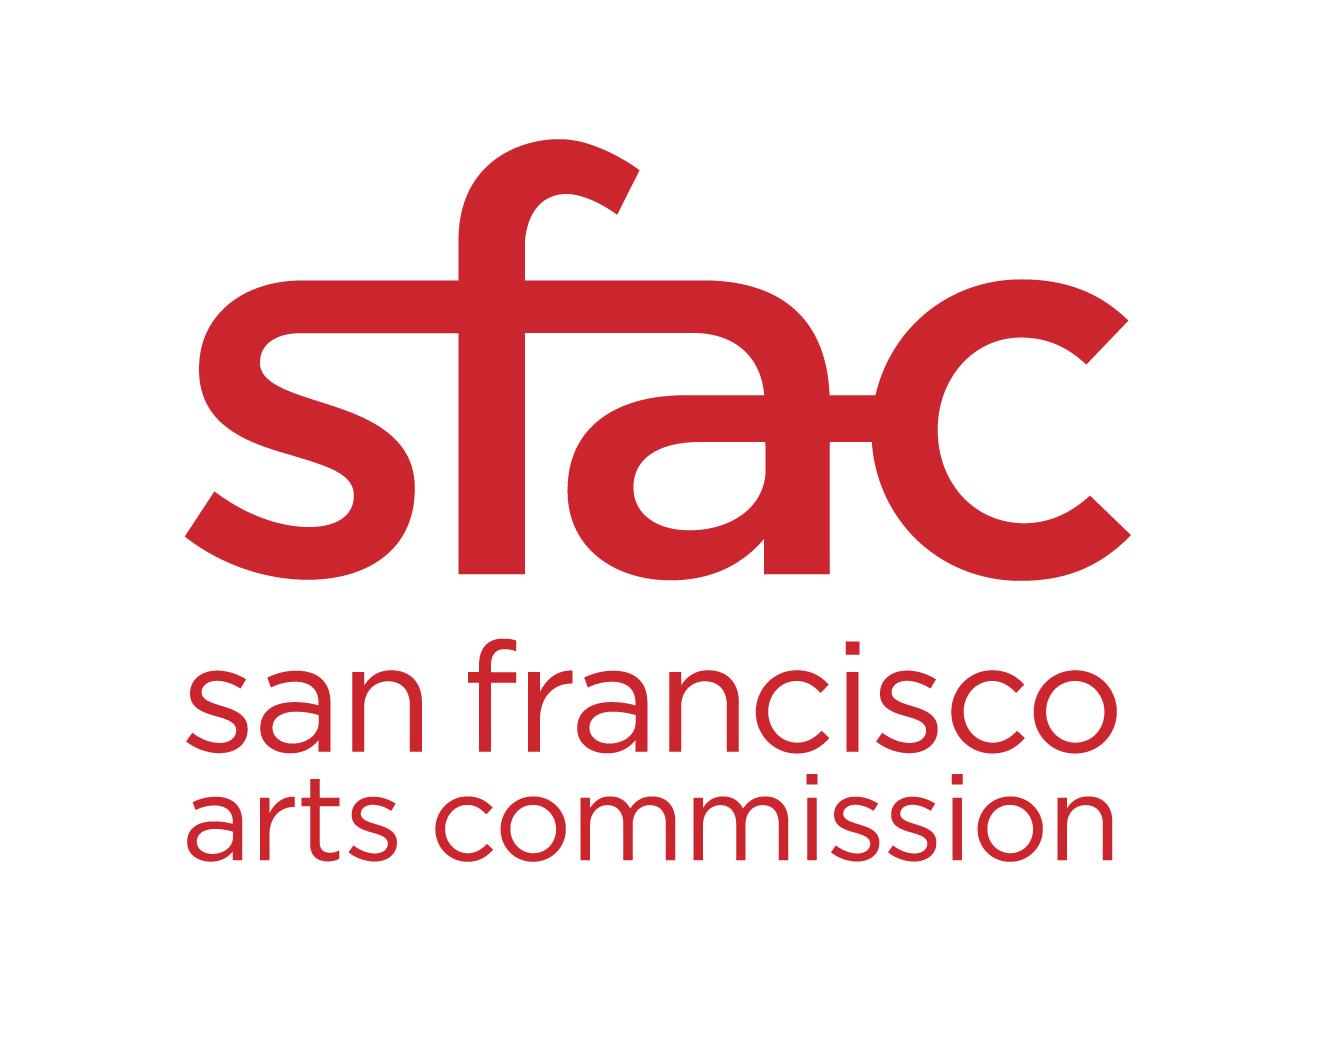 sfac_logo.jpg